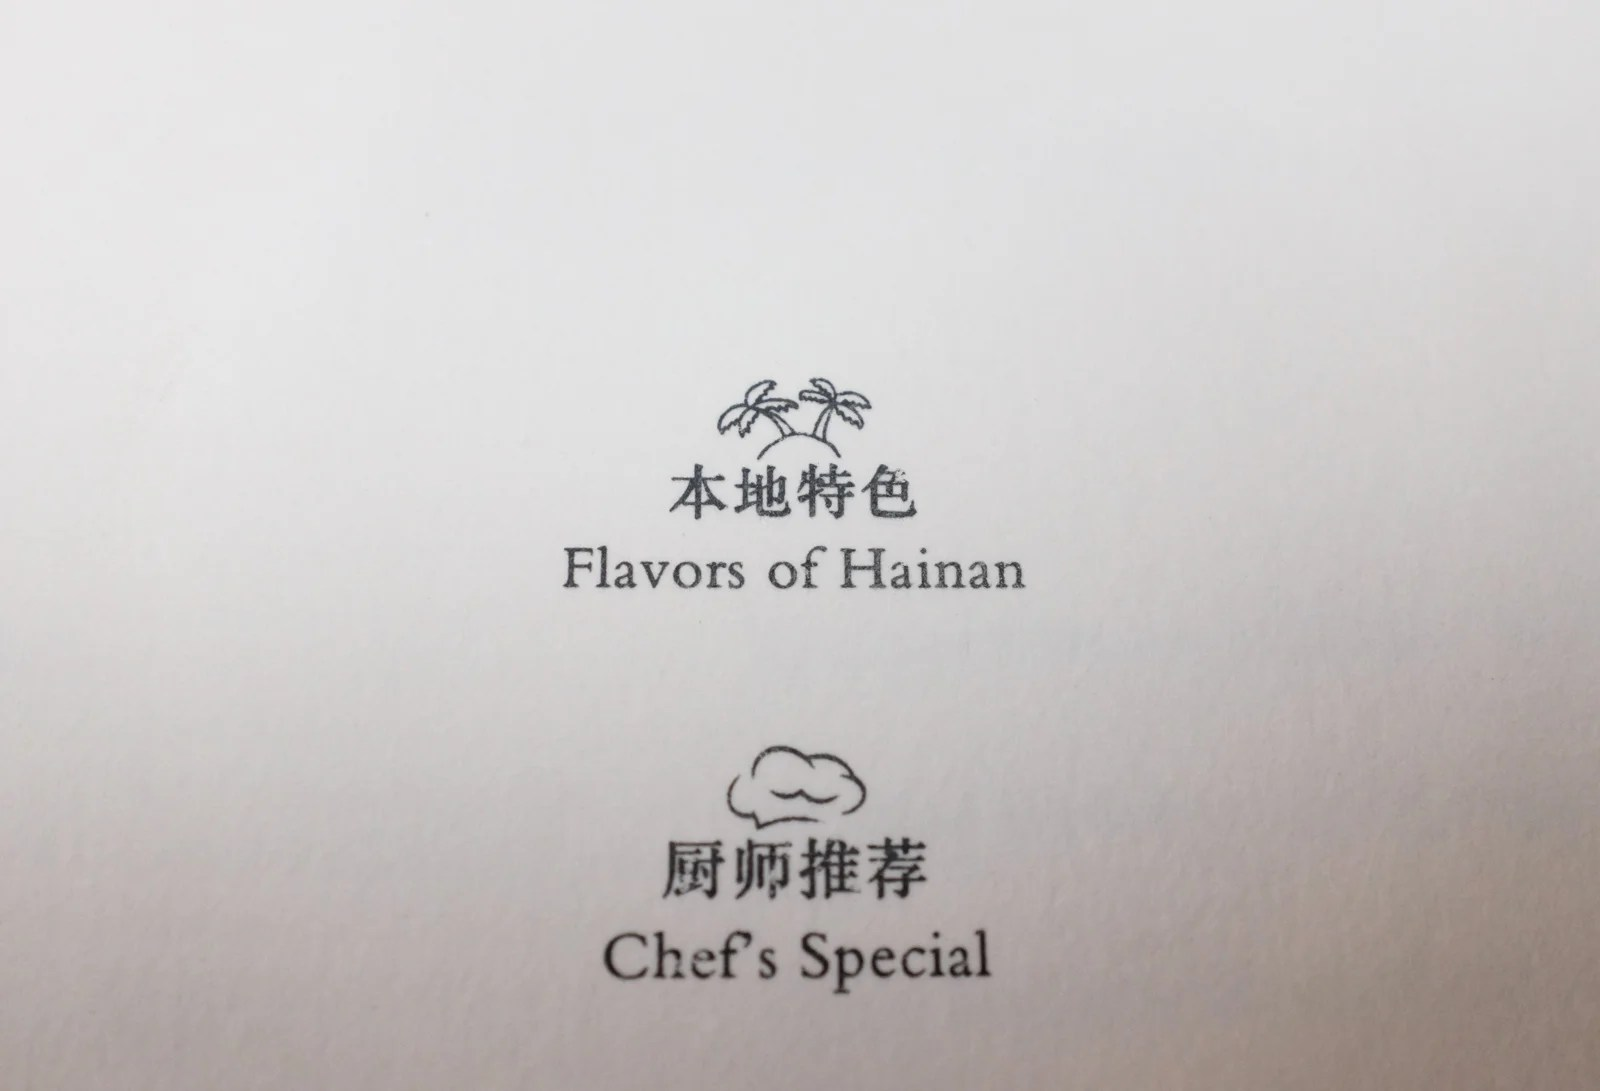 A Review of the Park Hyatt Sanya on Hainan Island, China